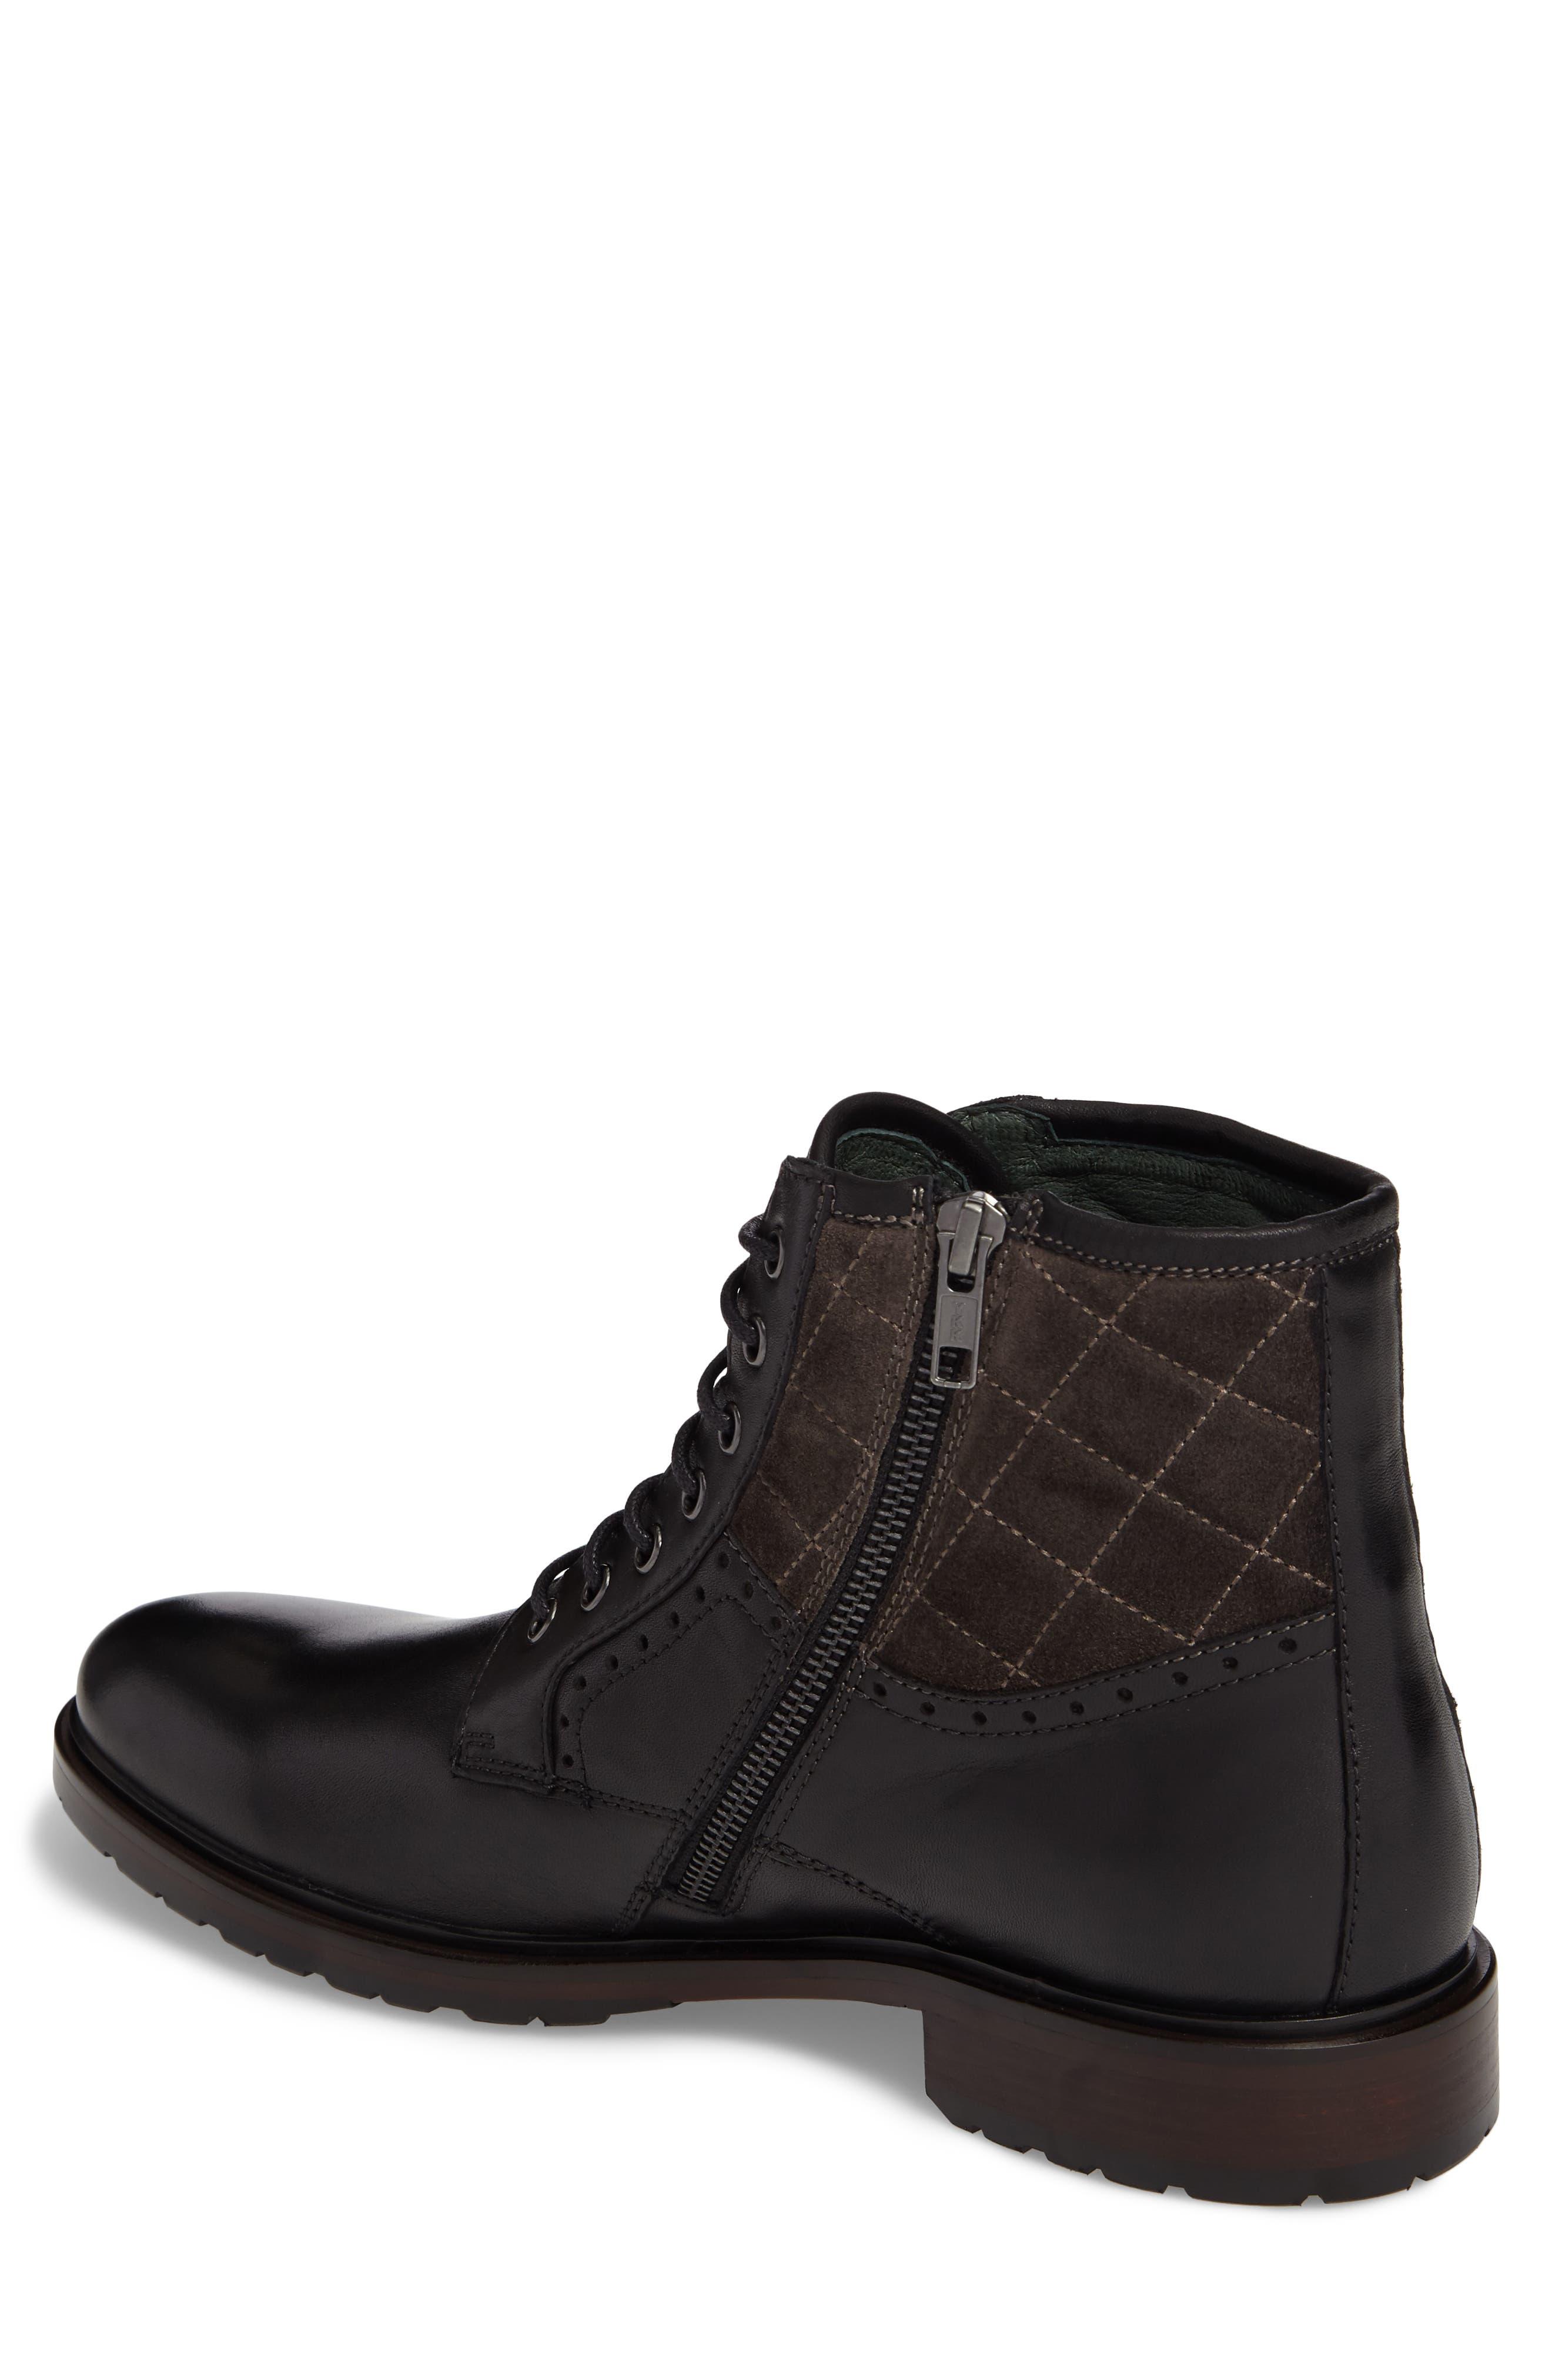 Myles Plain Toe Boot,                             Alternate thumbnail 2, color,                             Black Leather